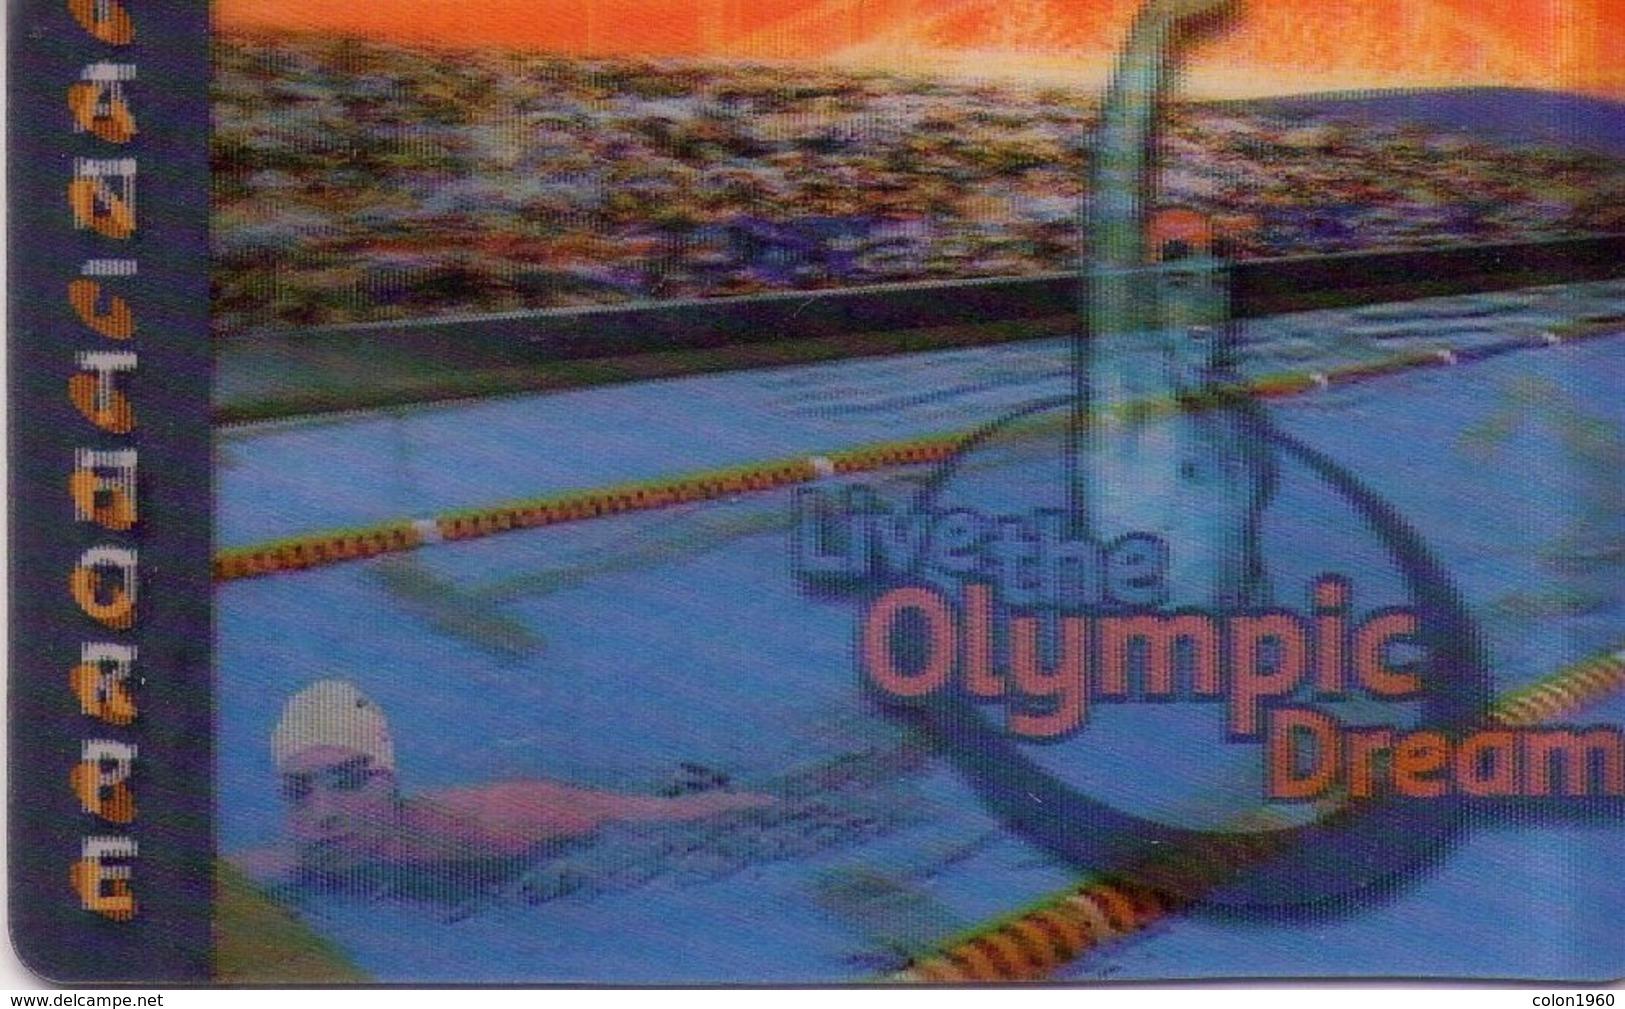 TARJETA TELEFONICA DE AUSTRALIA (PREPAGO). (IMAGEN MOVIBLE - 3D). Living The Olympic Dream - Ian Thorpe. 9900043PA (012) - Jeux Olympiques